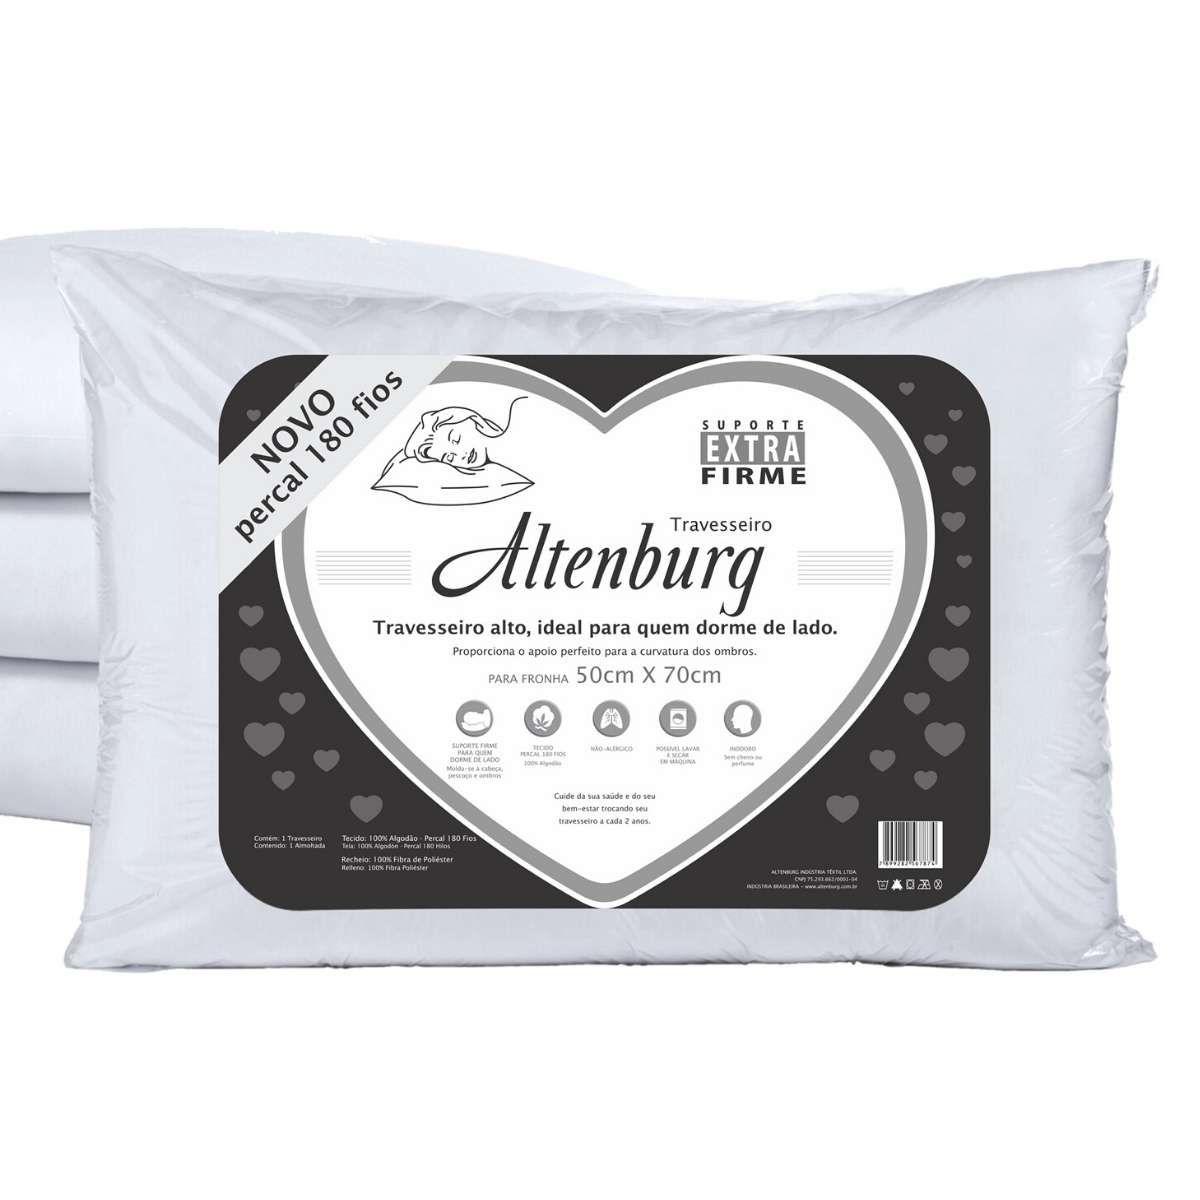 Travesseiro extra firme 50x70